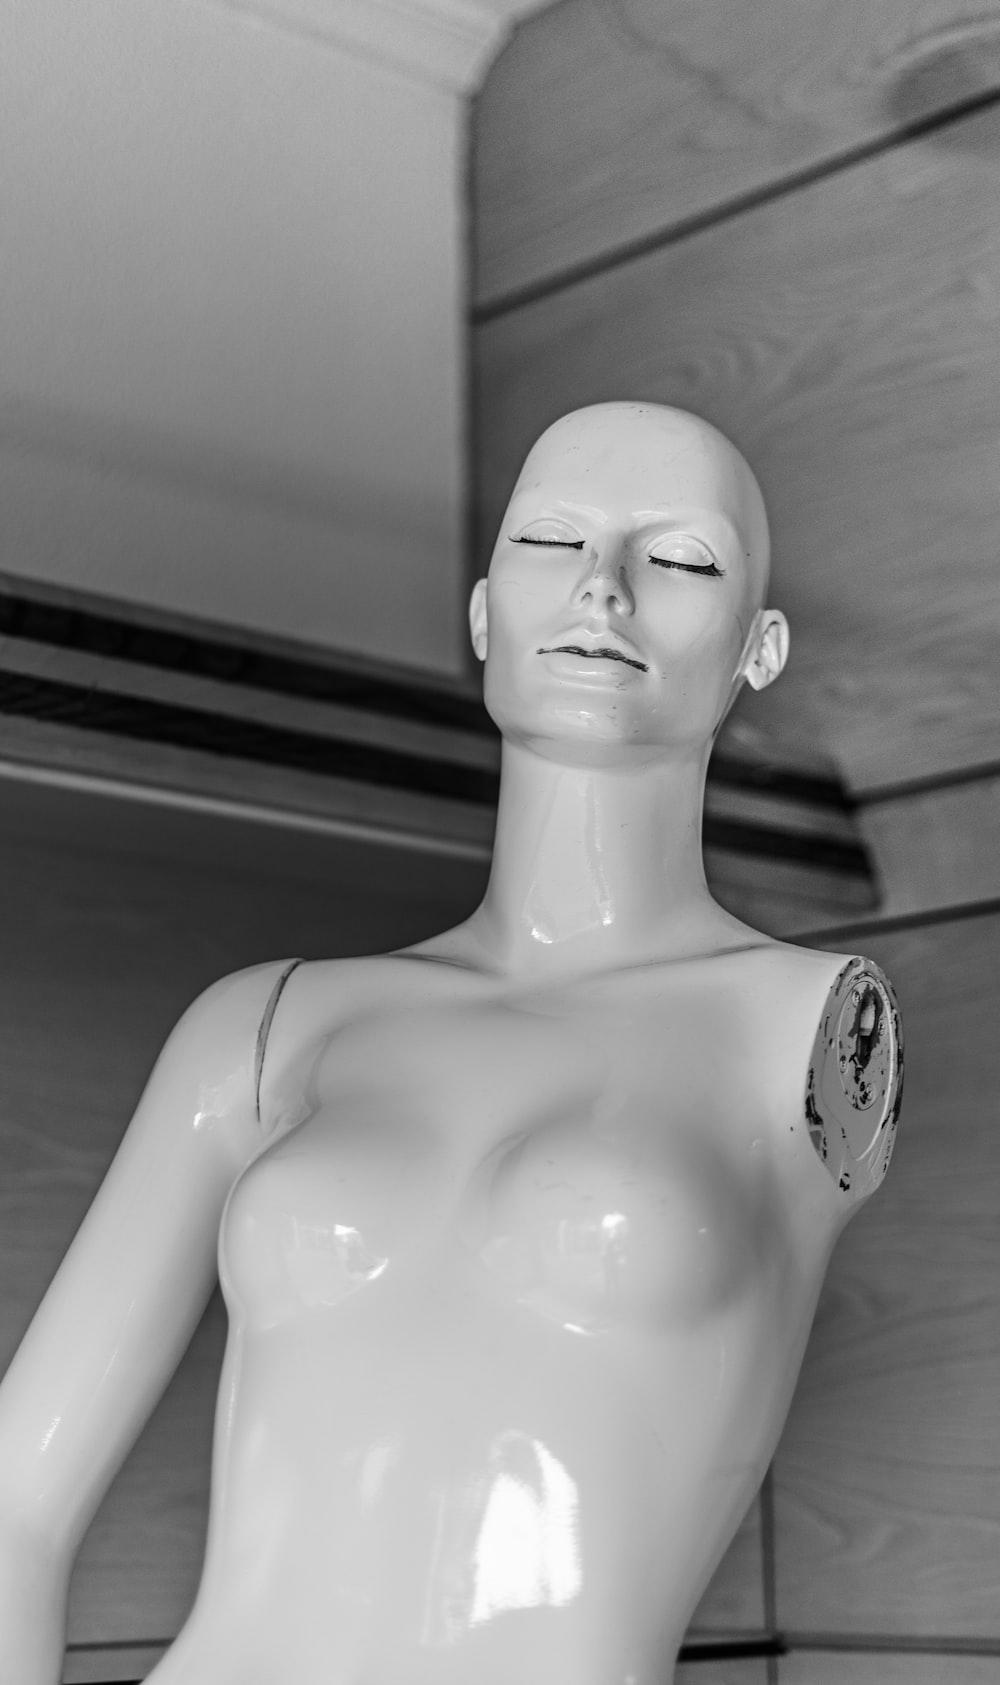 white plastic woman mannequin